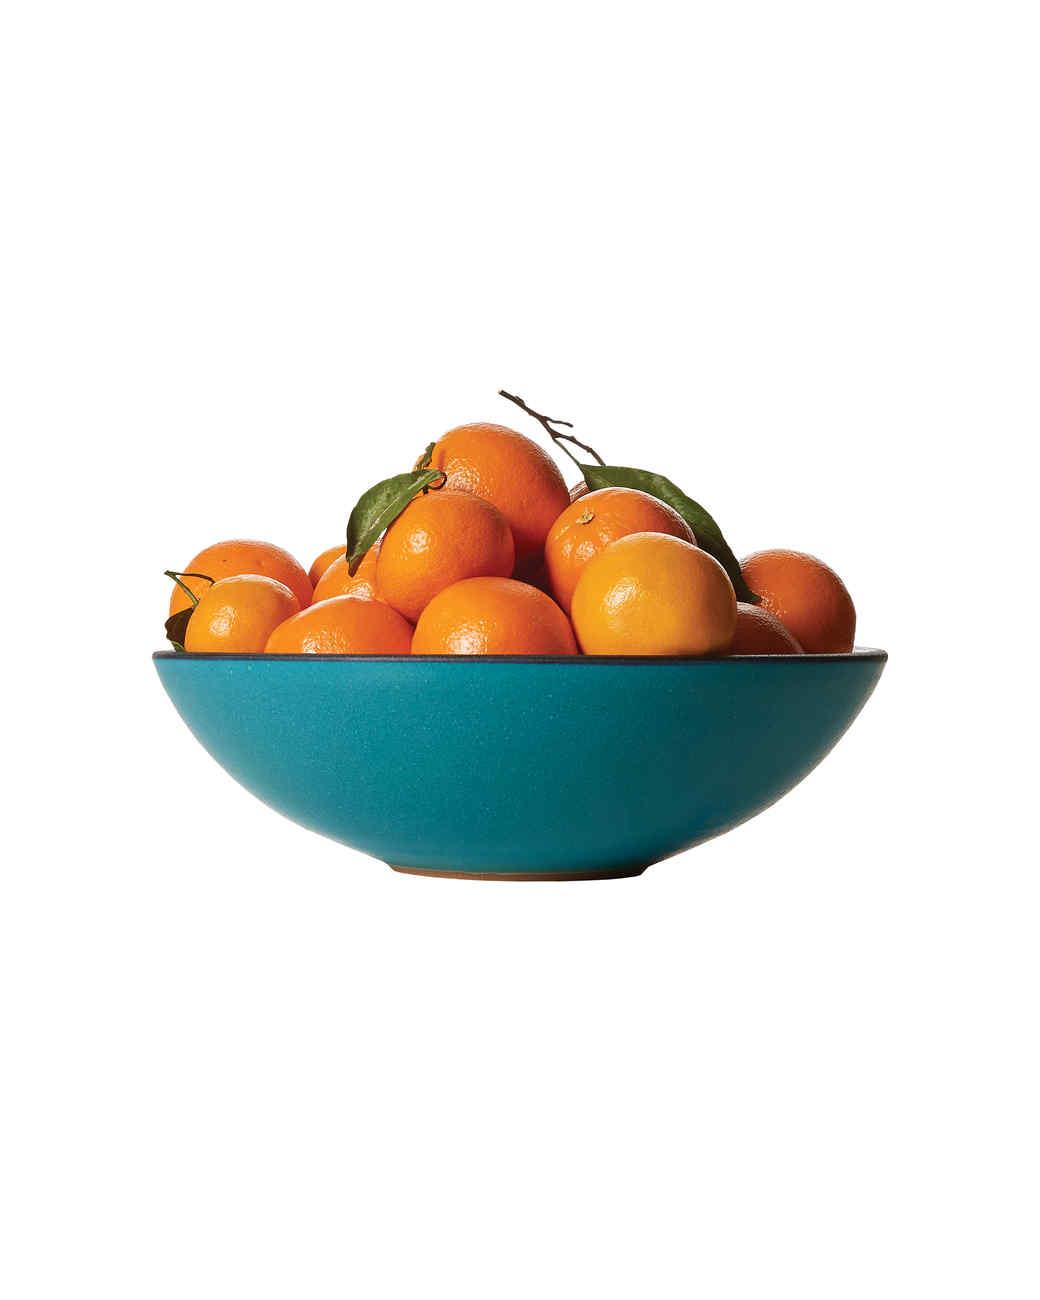 bowl-of-oranges-227-d112856_l.jpg